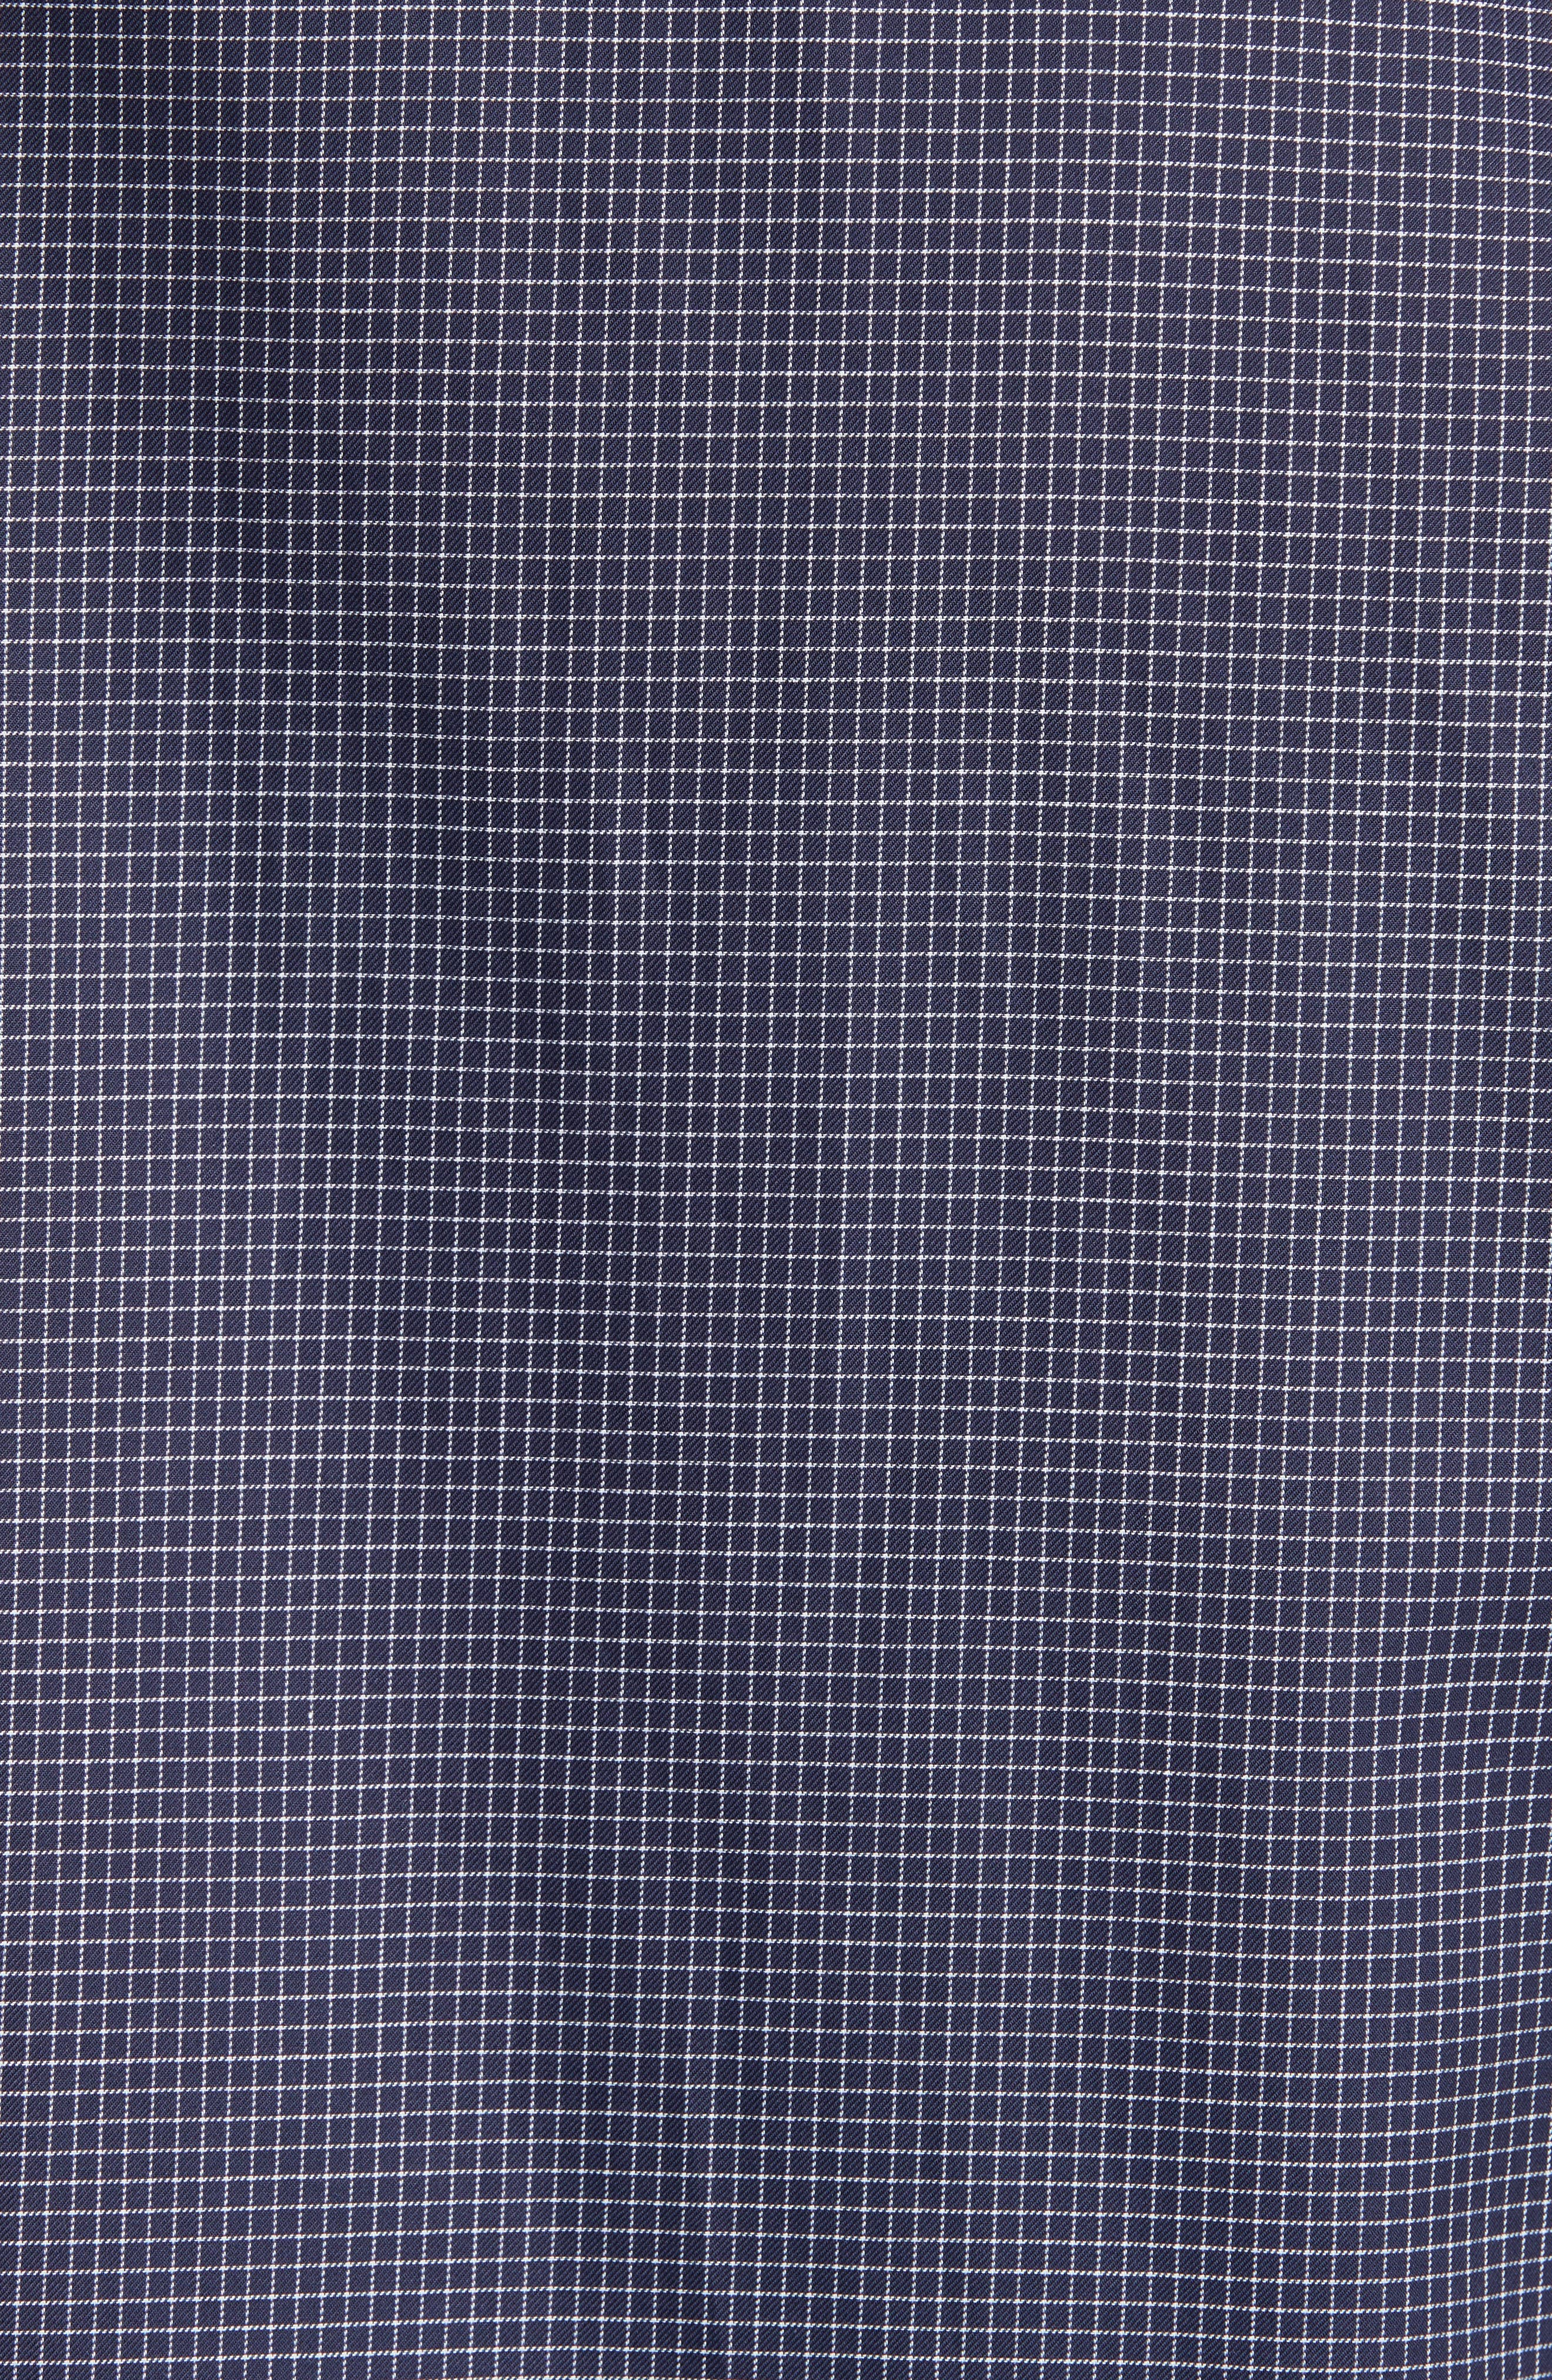 Slim Fit Grid Print Sport Shirt,                             Alternate thumbnail 5, color,                             484